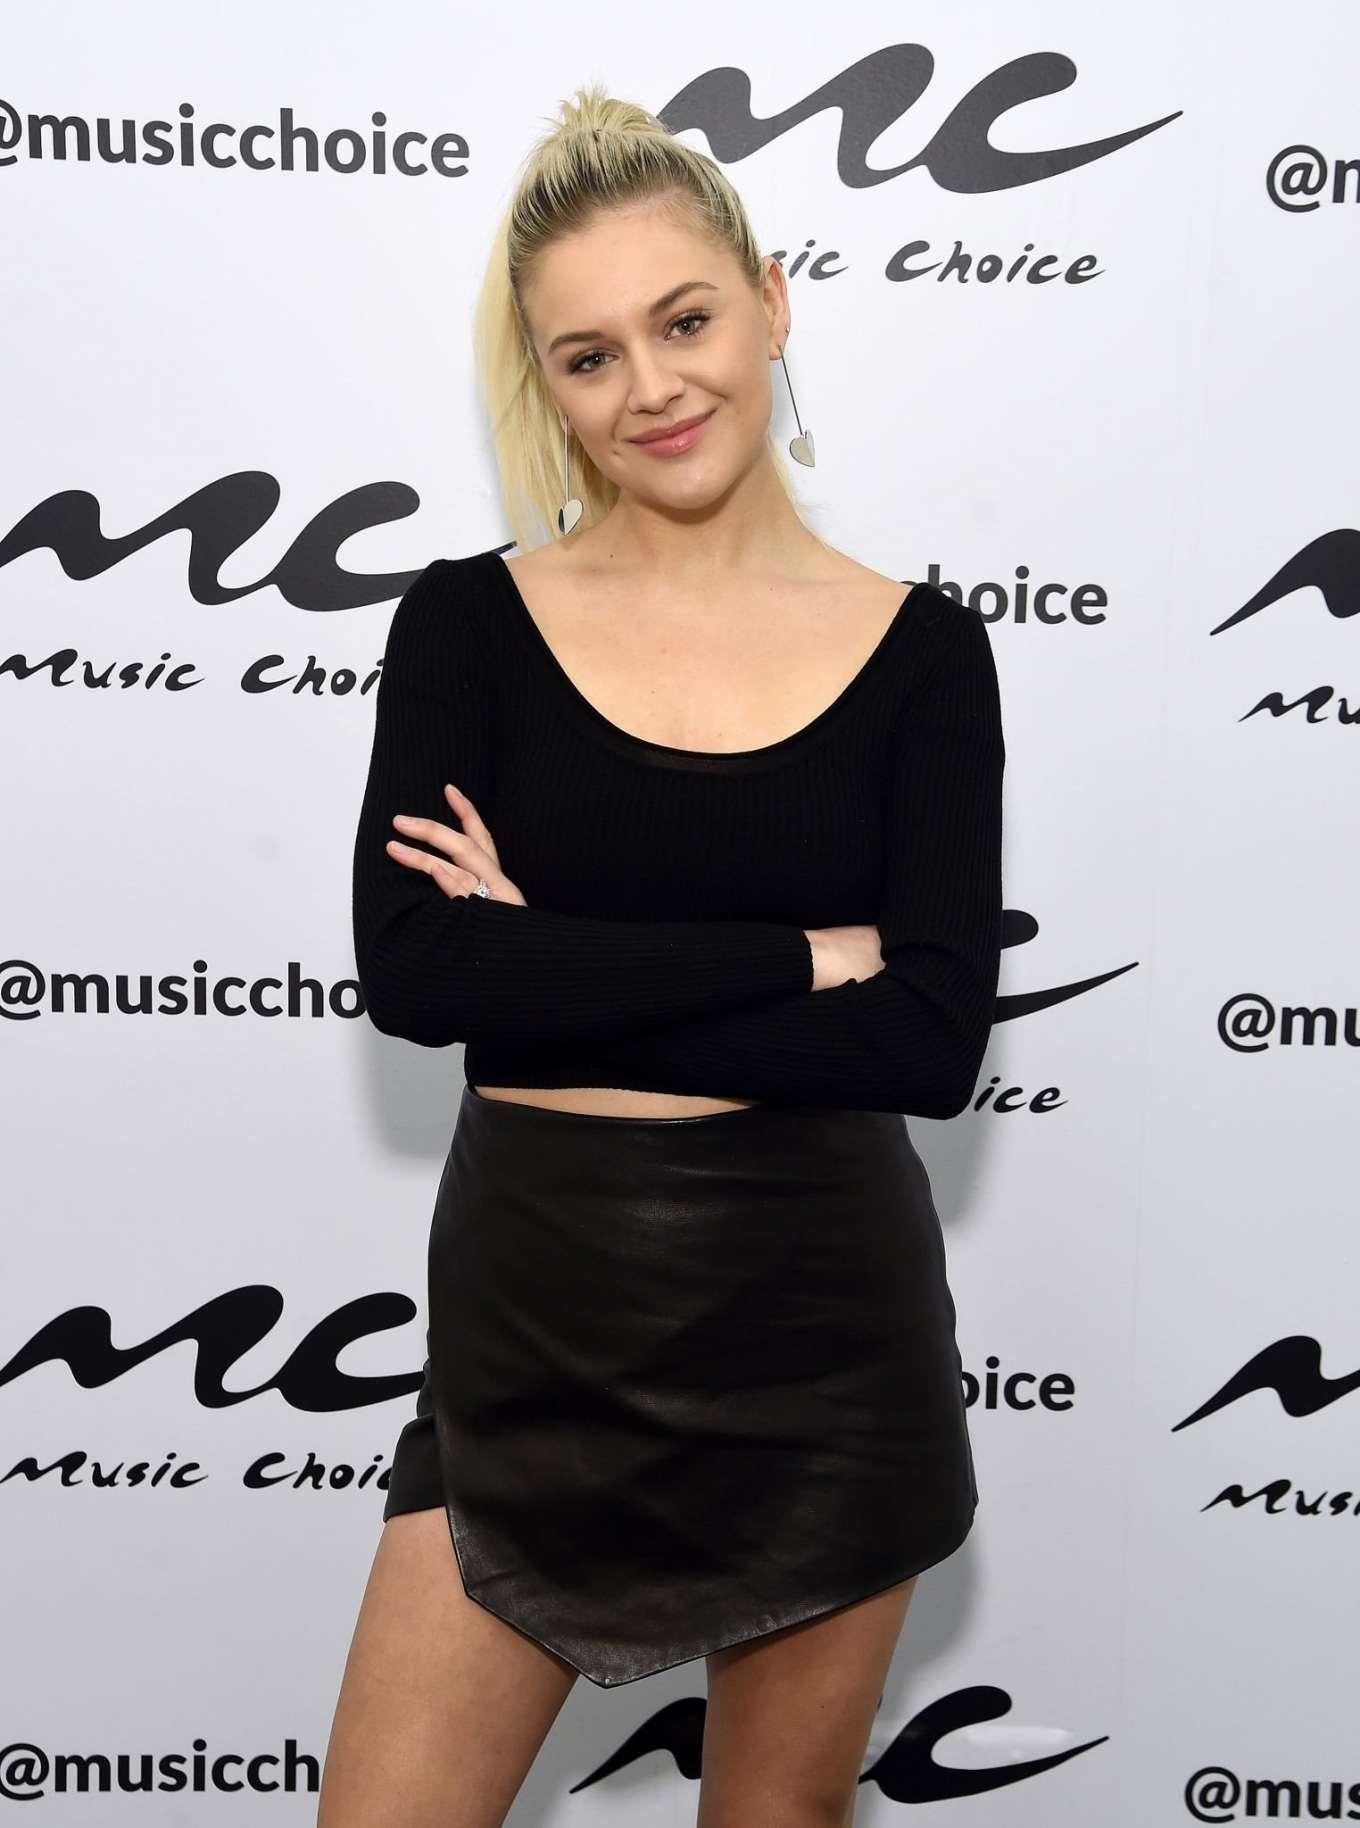 Kelsea Ballerini 2020 : Kelsea Ballerini visiting Music Choice in NYC-08